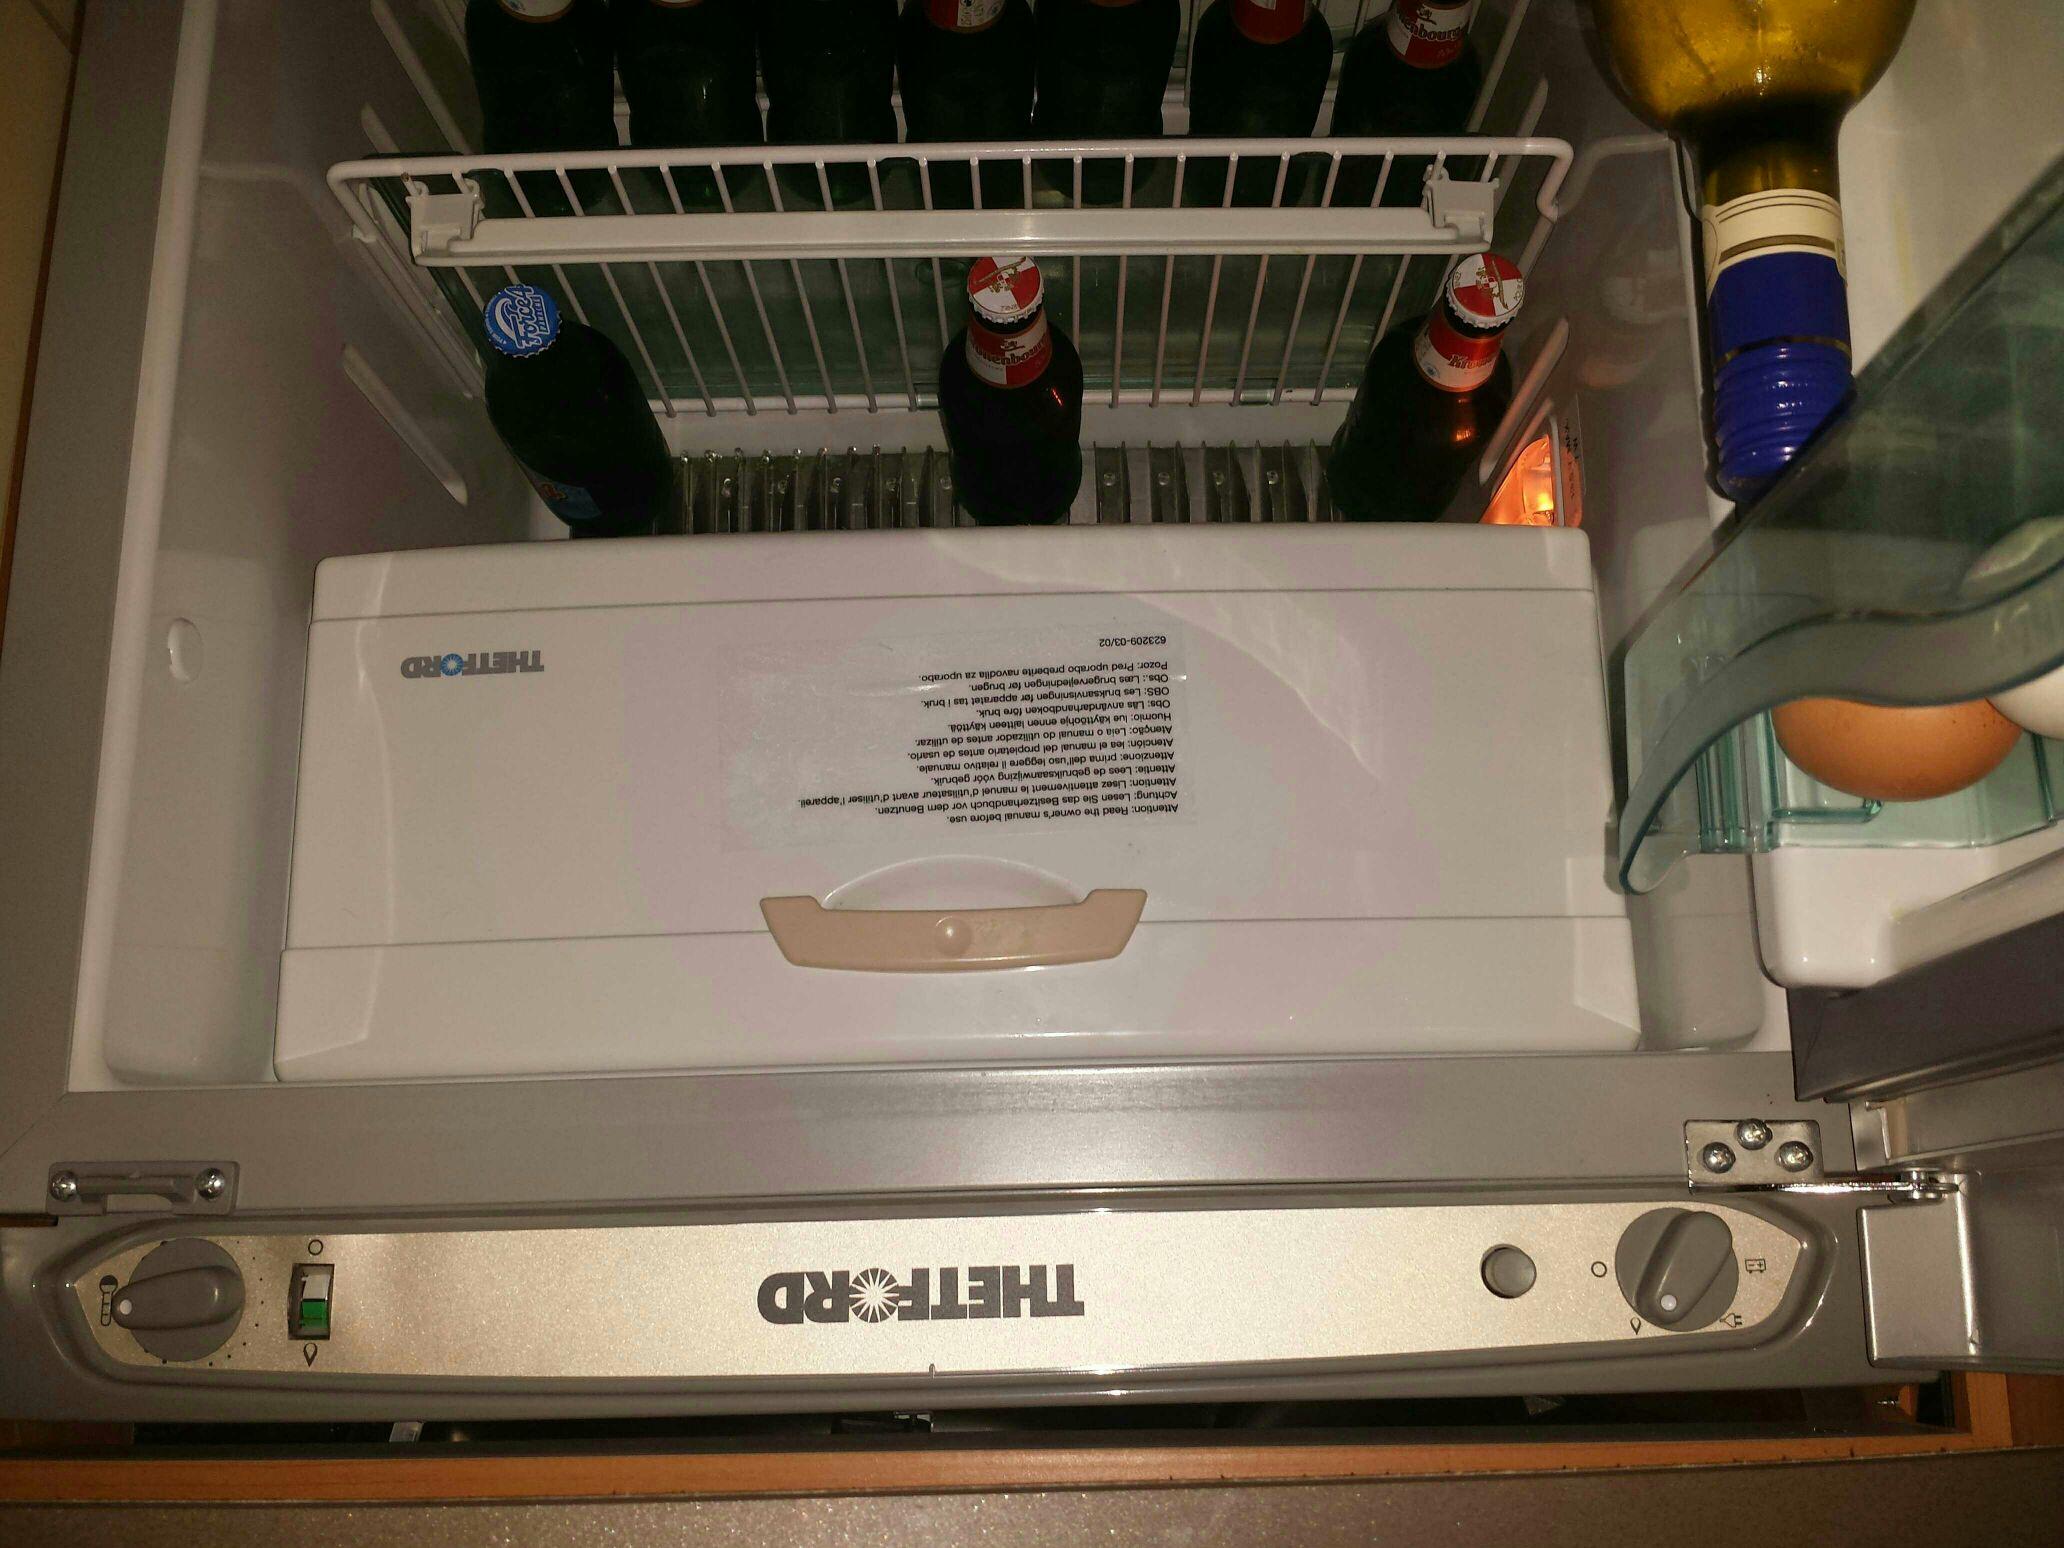 Red Bull Kühlschrank Dose Reinigen : Thetford kühlschrank n3000 kendra e. sikes